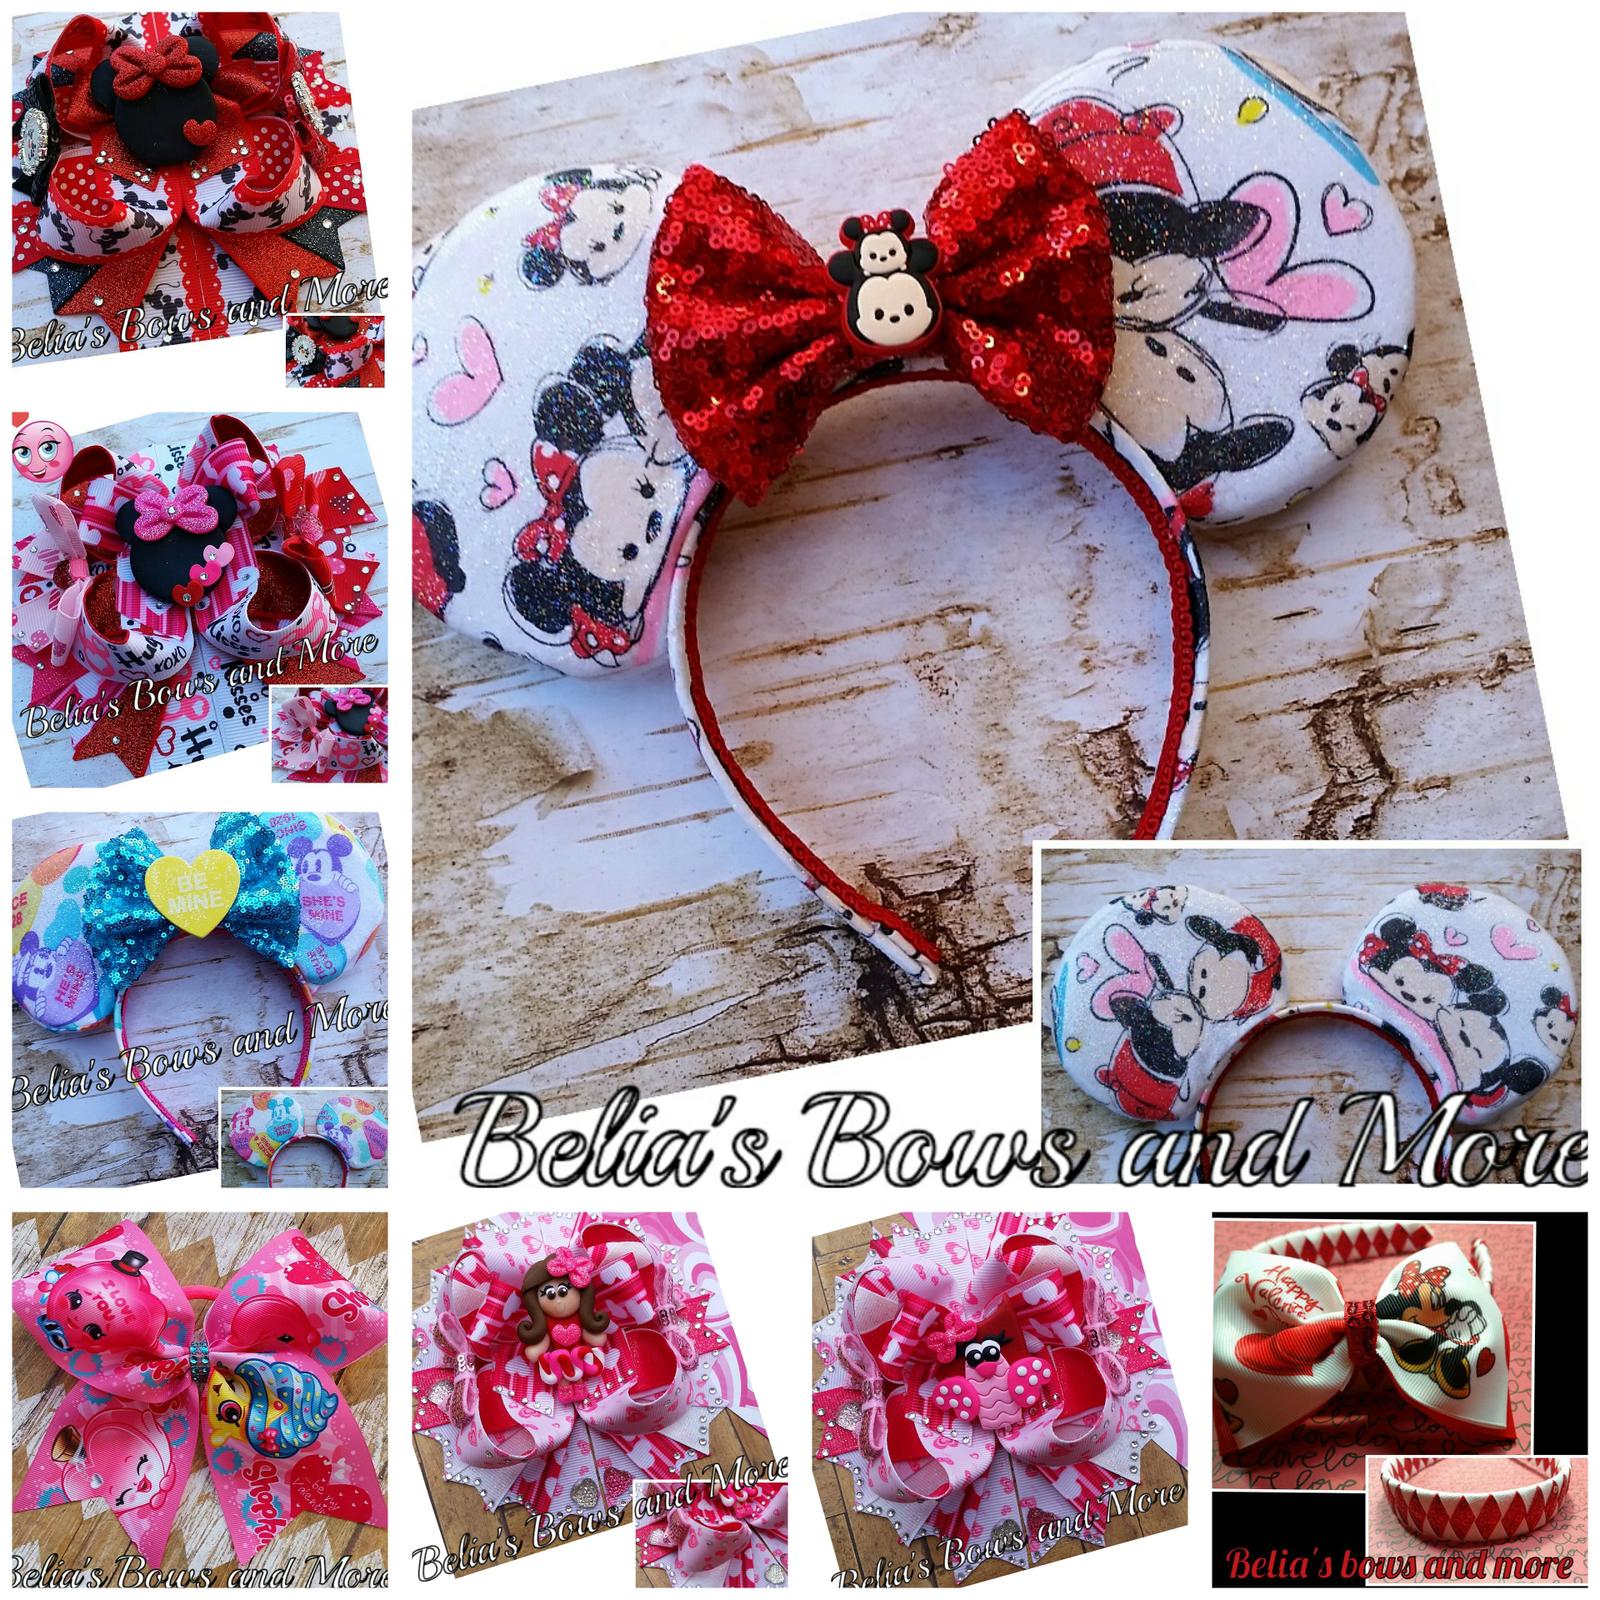 Pretty Ribbons and Handmade Bows